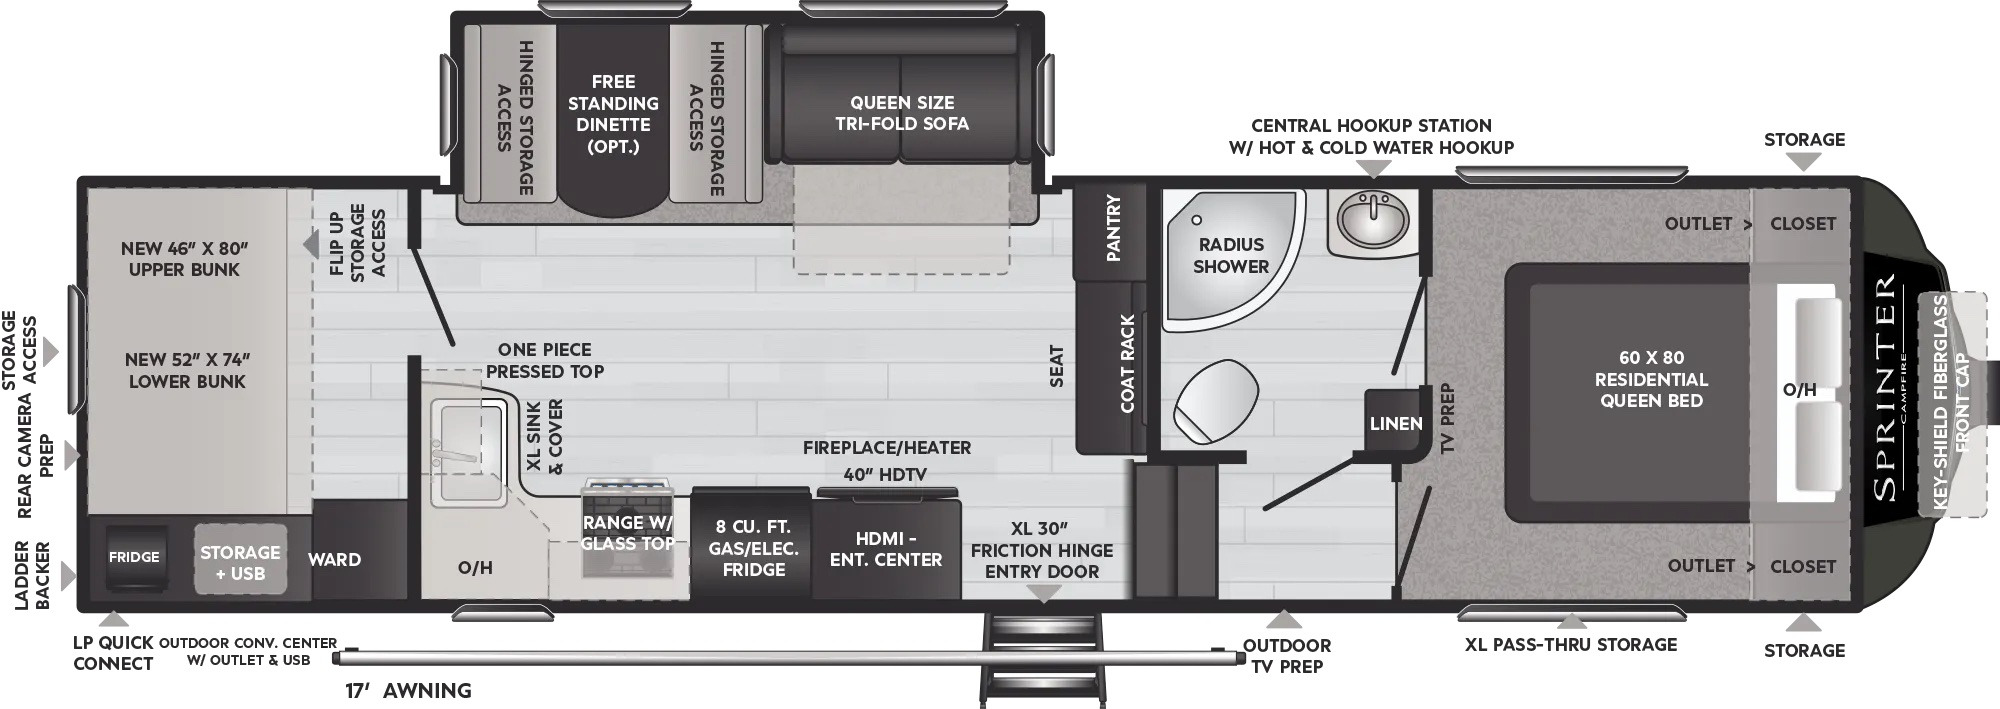 View Floor Plan for 2022 KEYSTONE SPRINTER F29BH